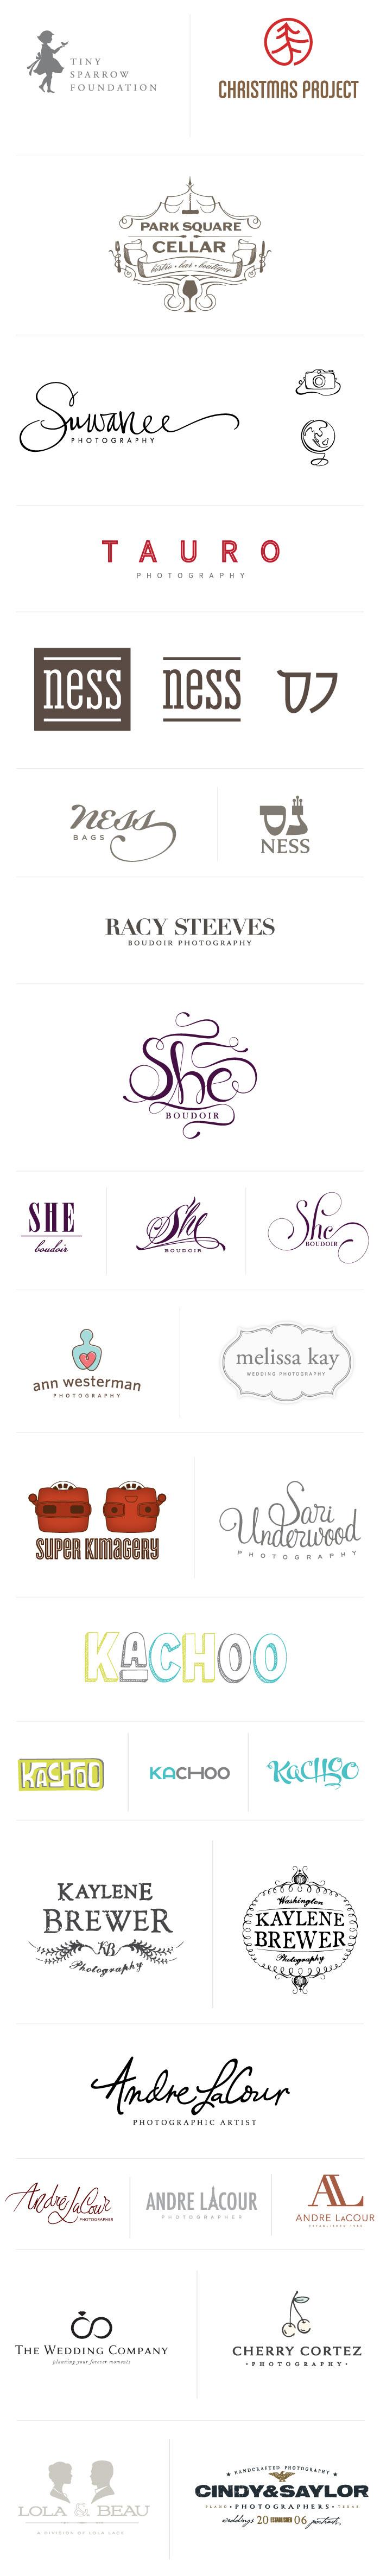 Logo portfolio from Braizen (great use of fonts)